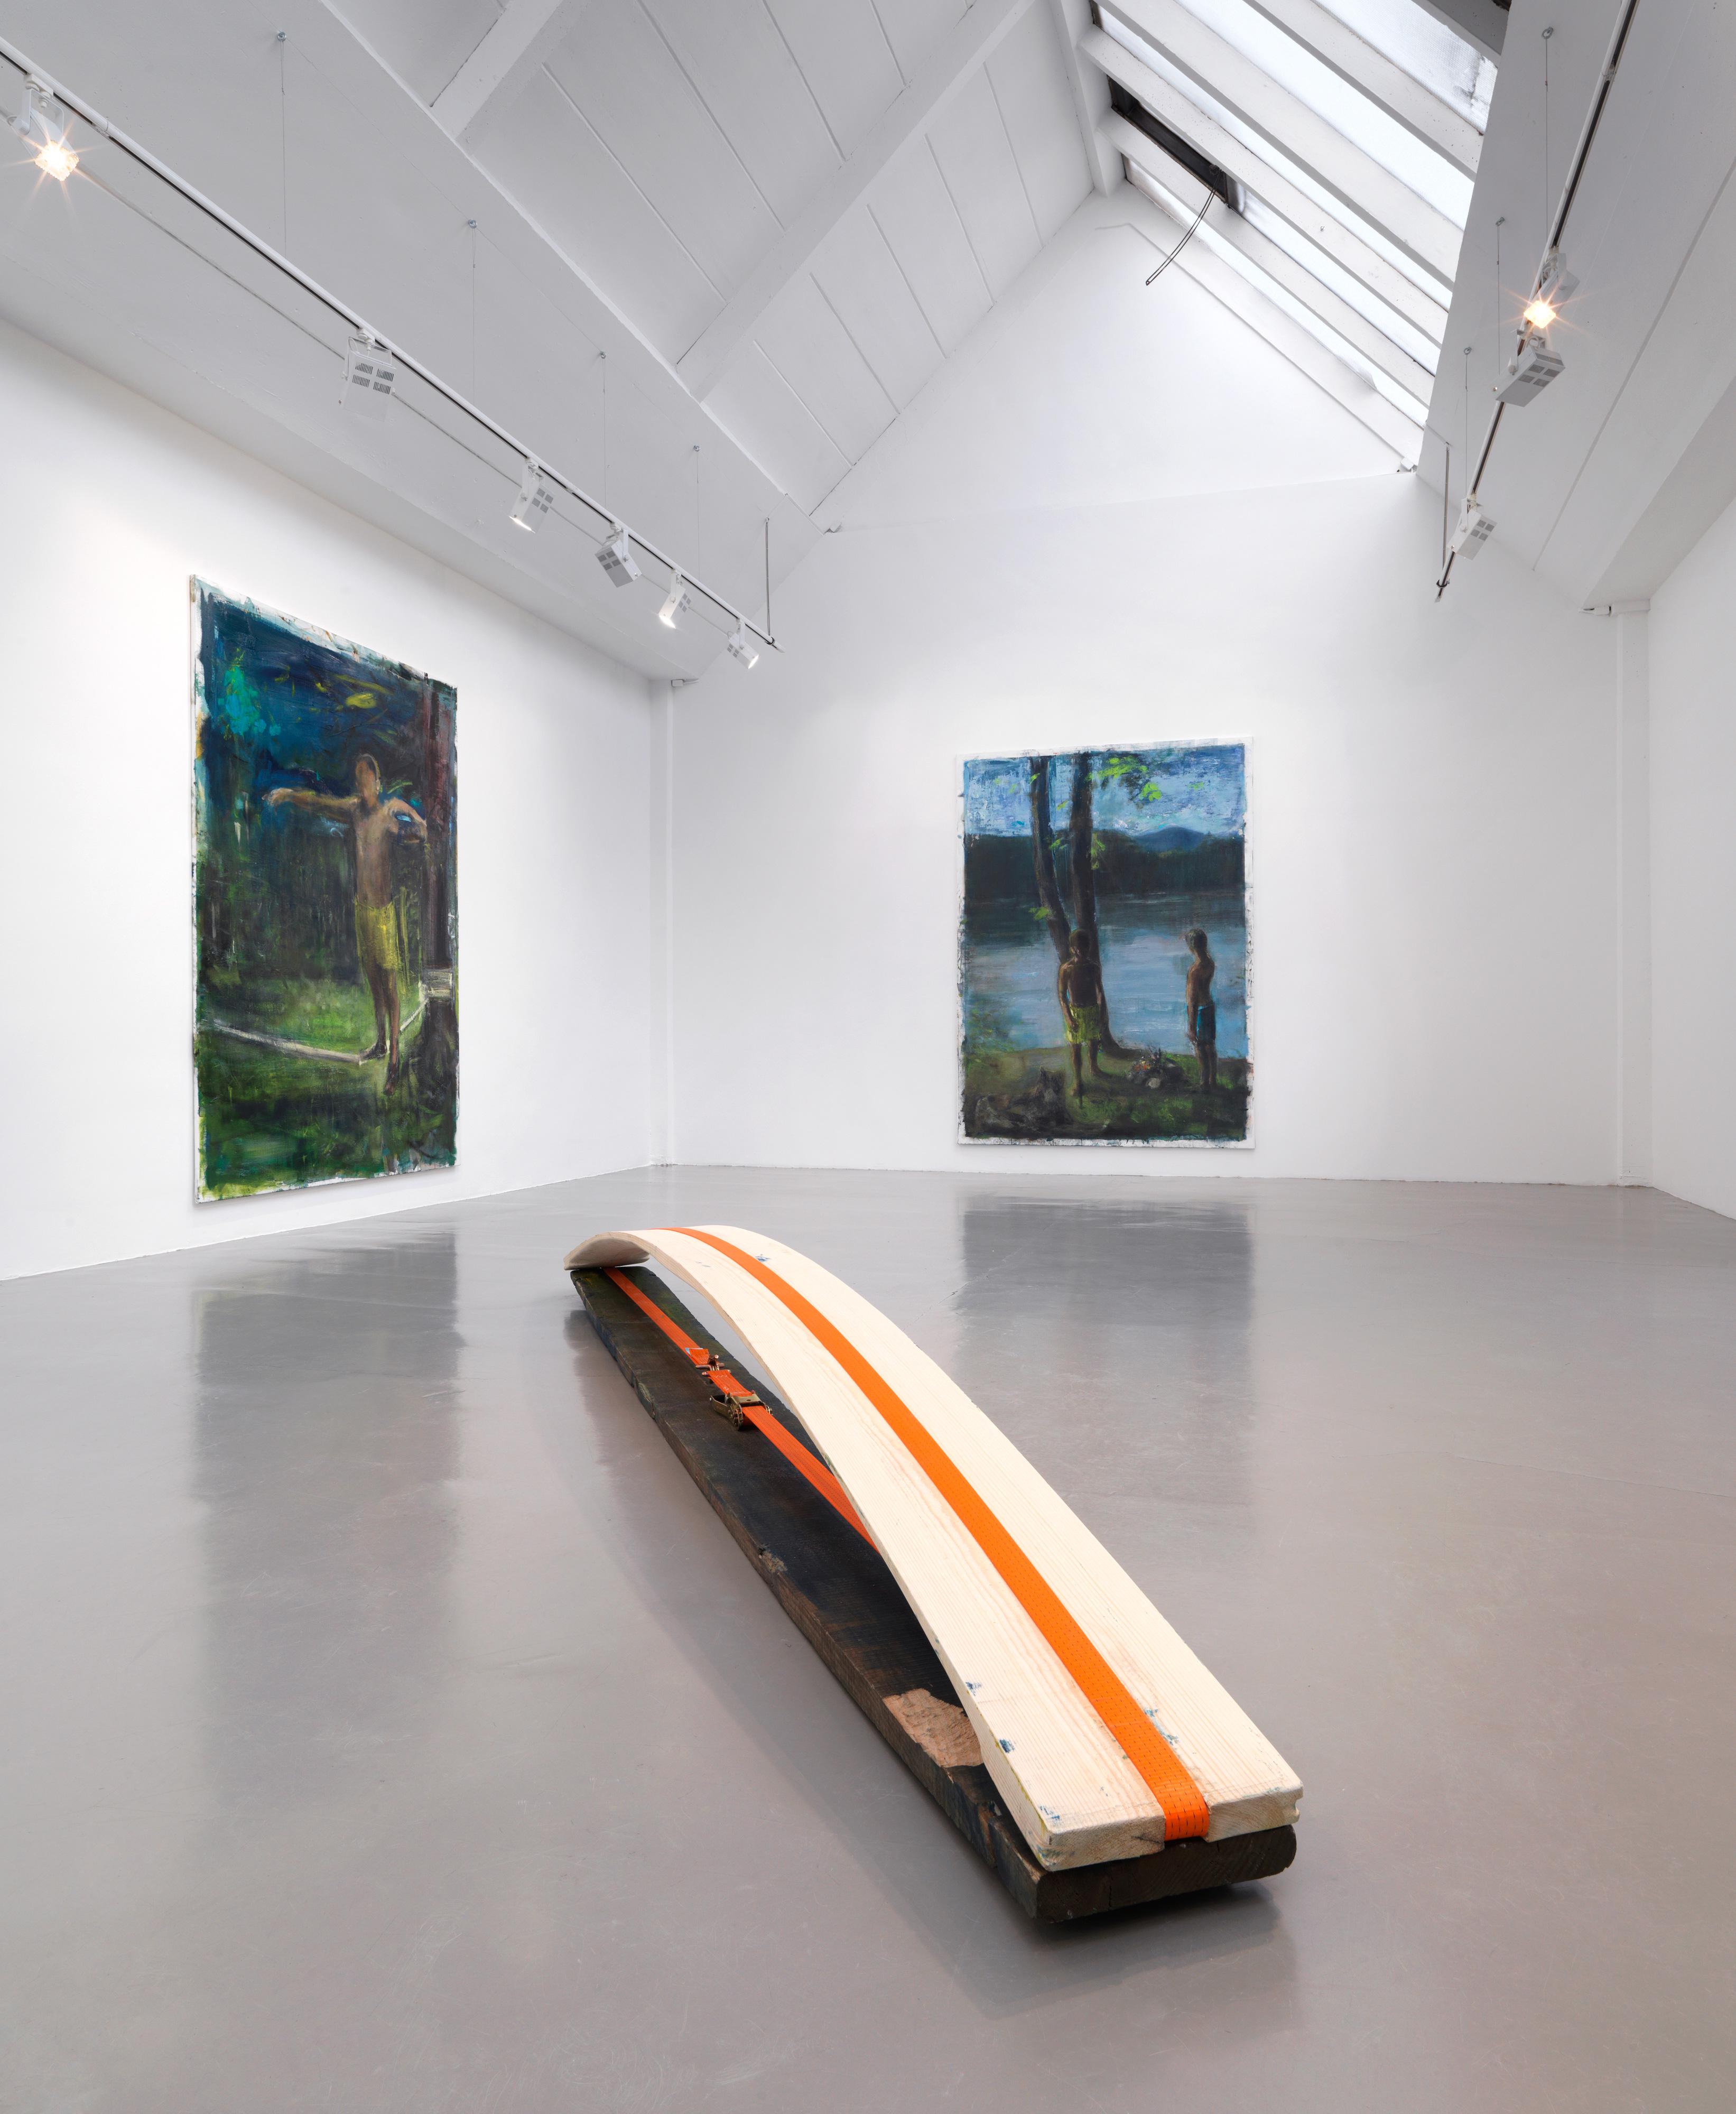 Galerie Barbara Thumm \ Simon Cantemir Hausì: Untitled (SCa-14-021) \ Untitled (2014)